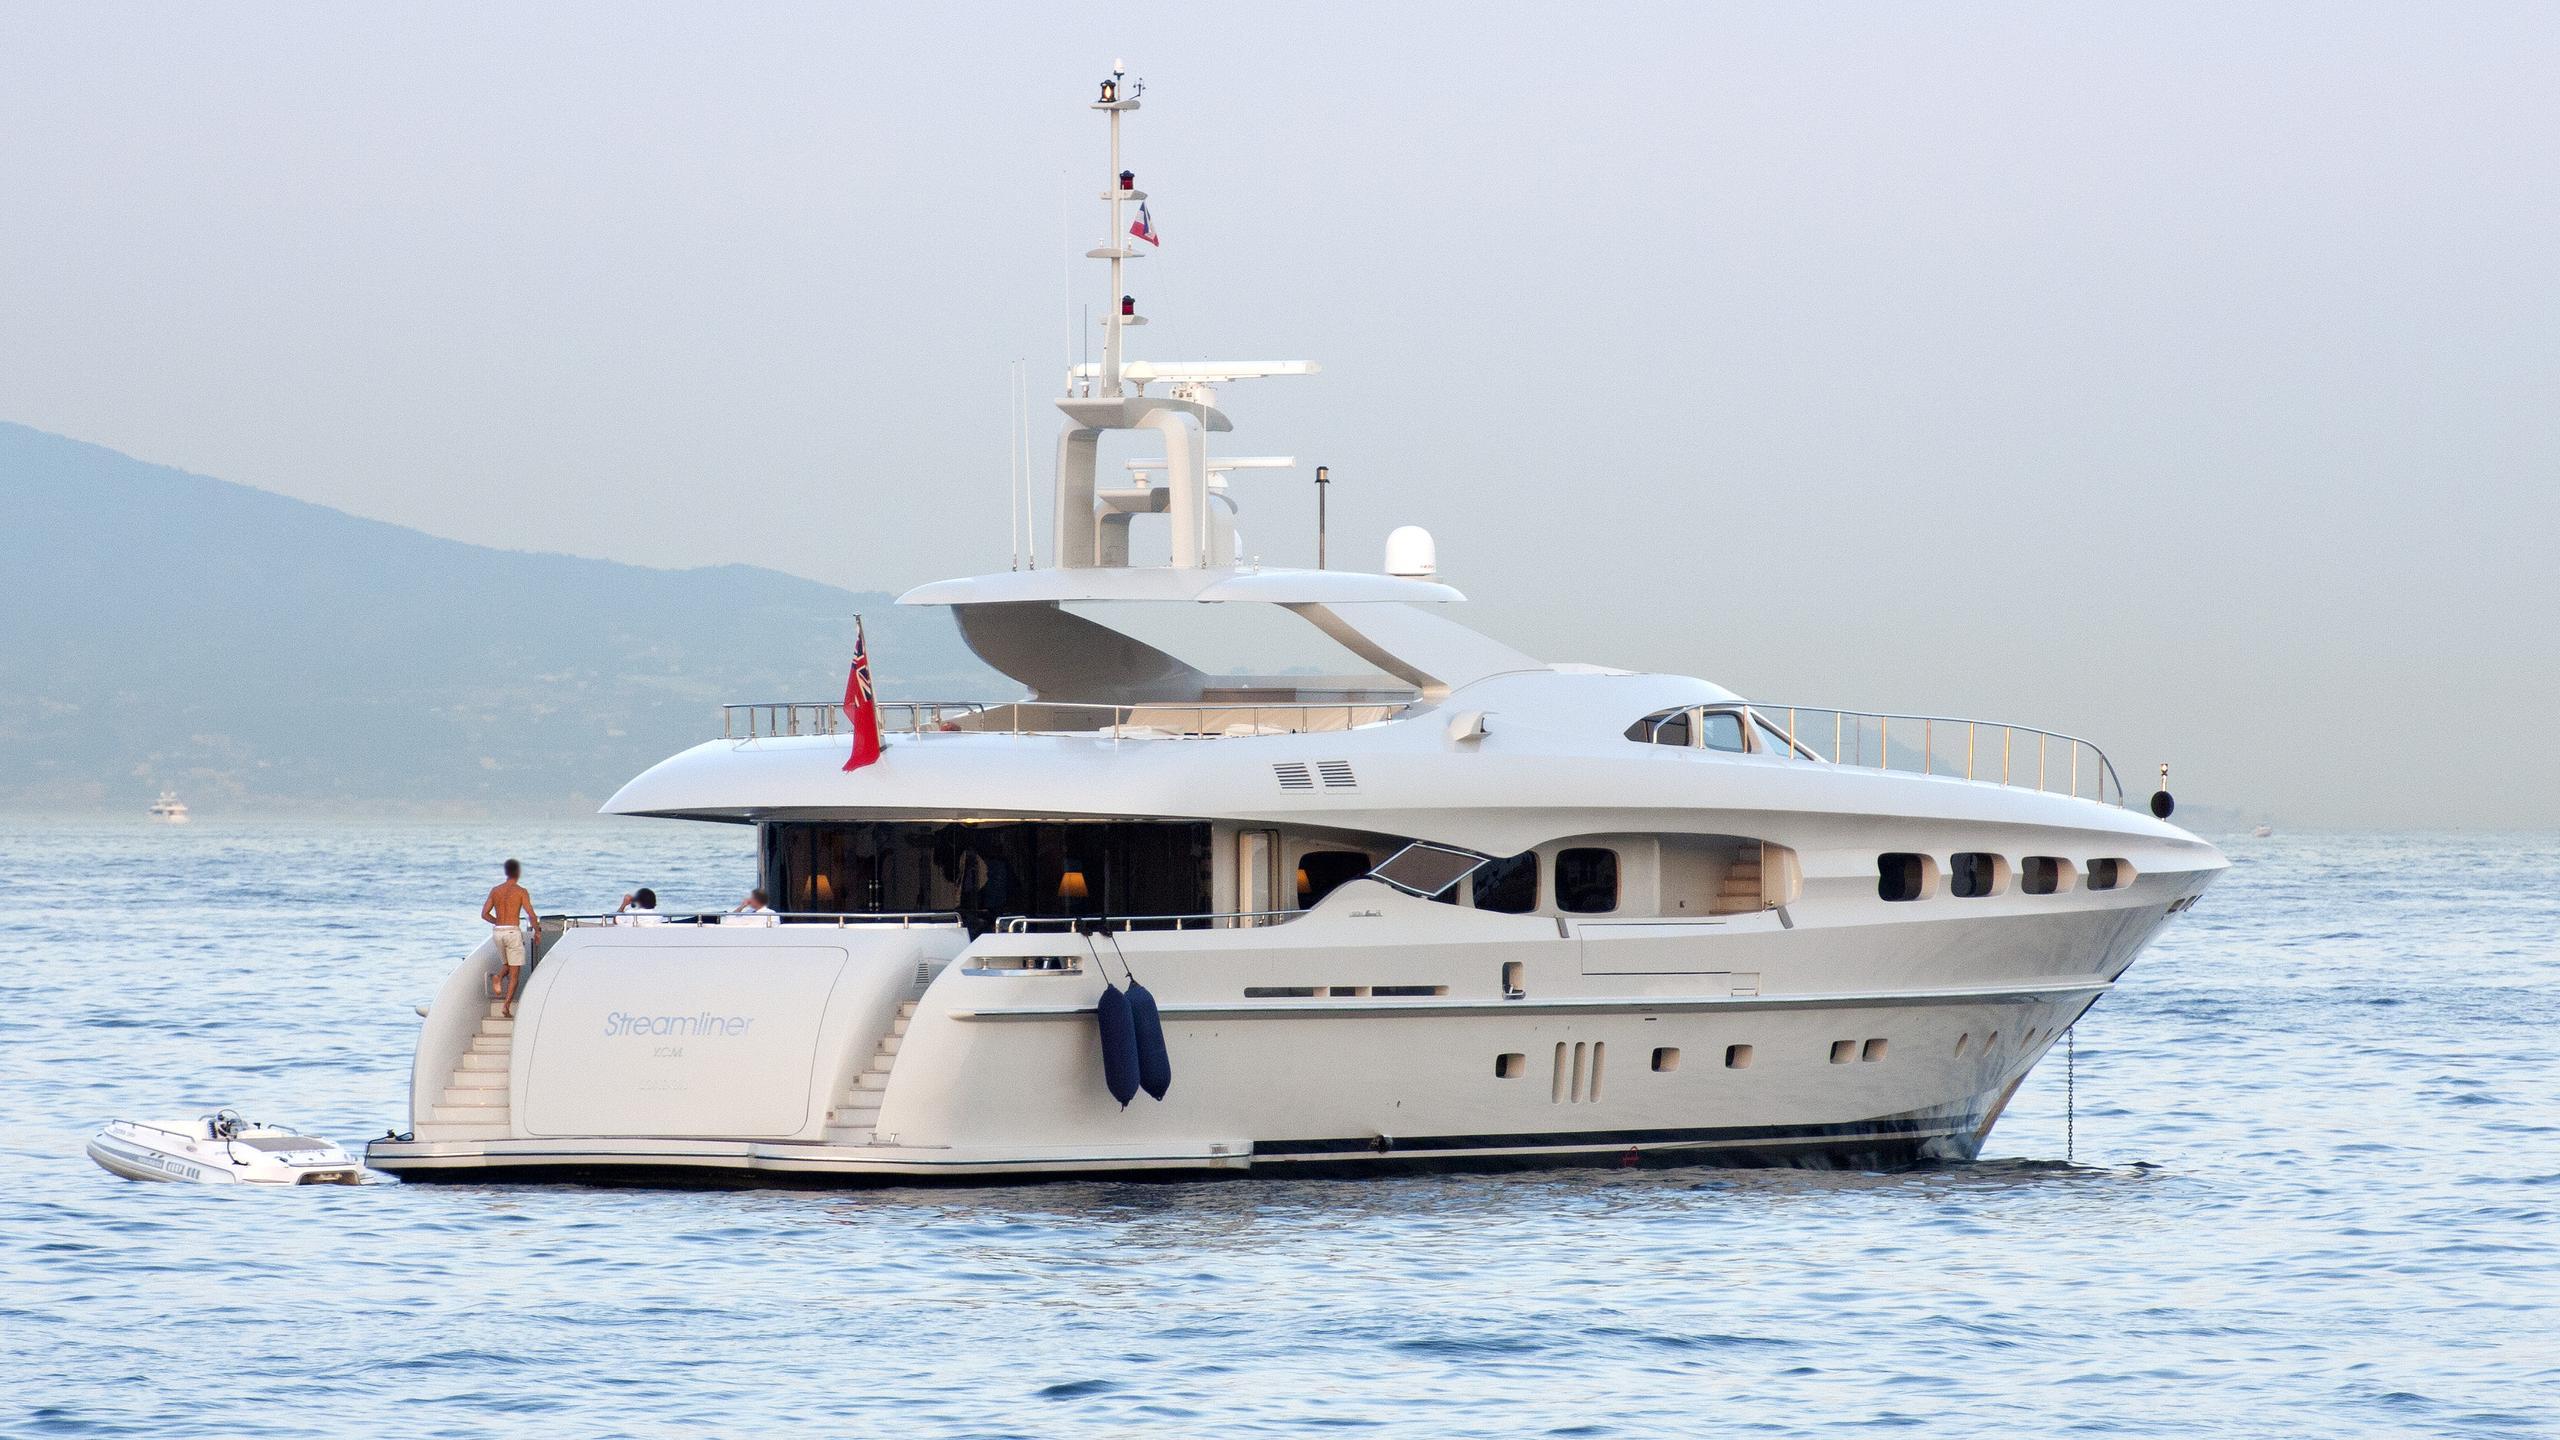 infinity-pacific-motor-yacht-mondomarine-2007-41m-half-profile